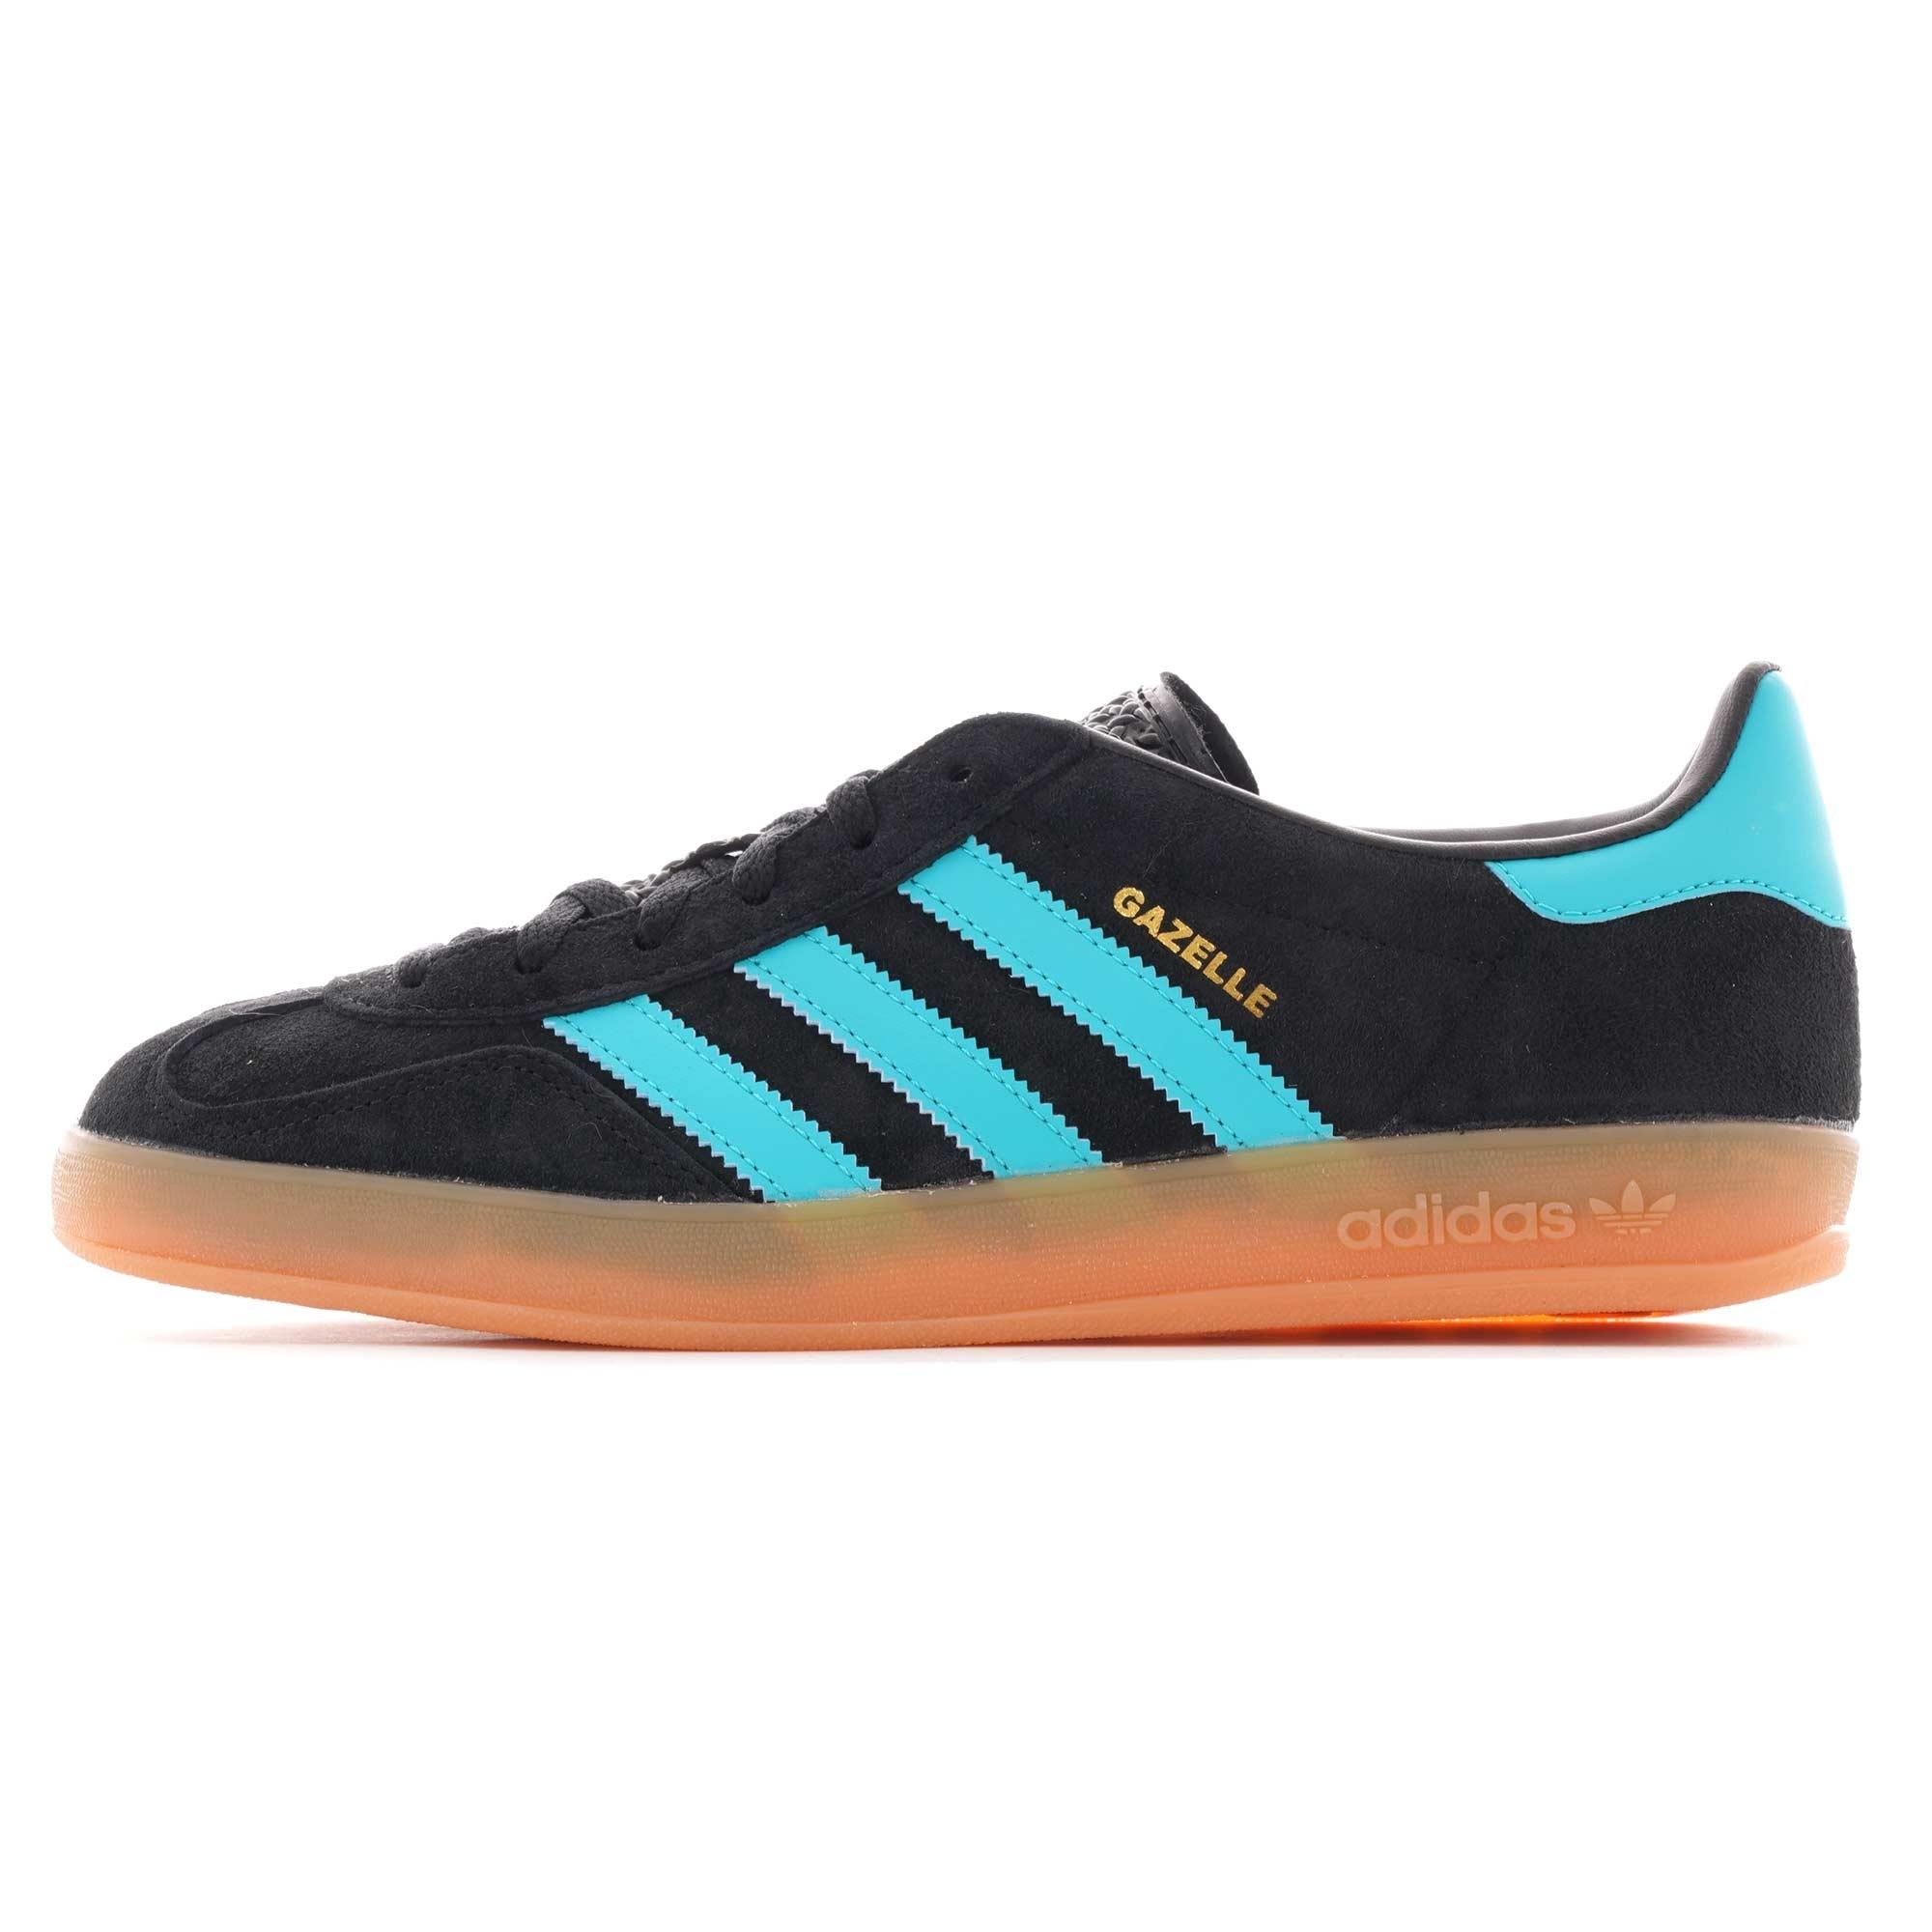 Adidas Gazelle Indoor Men/'s Black Turquoise Trainers